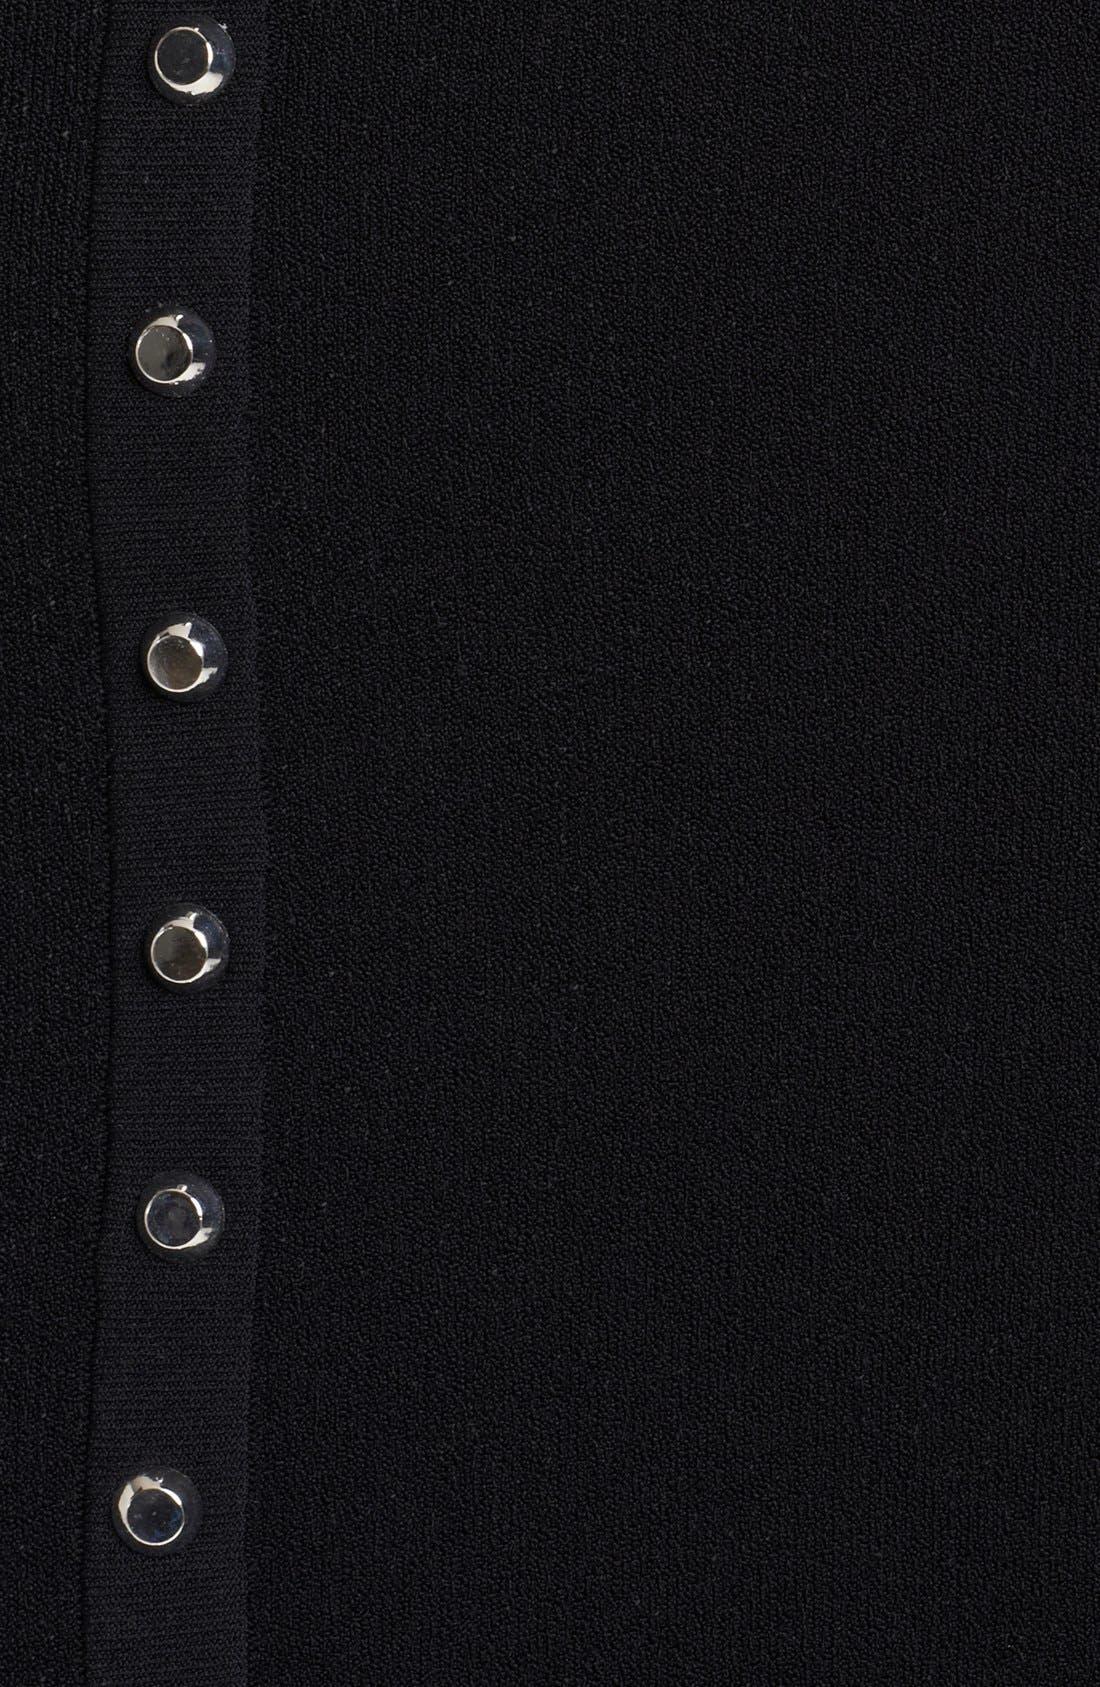 Alternate Image 3  - Michael Kors Studded Knit Dress